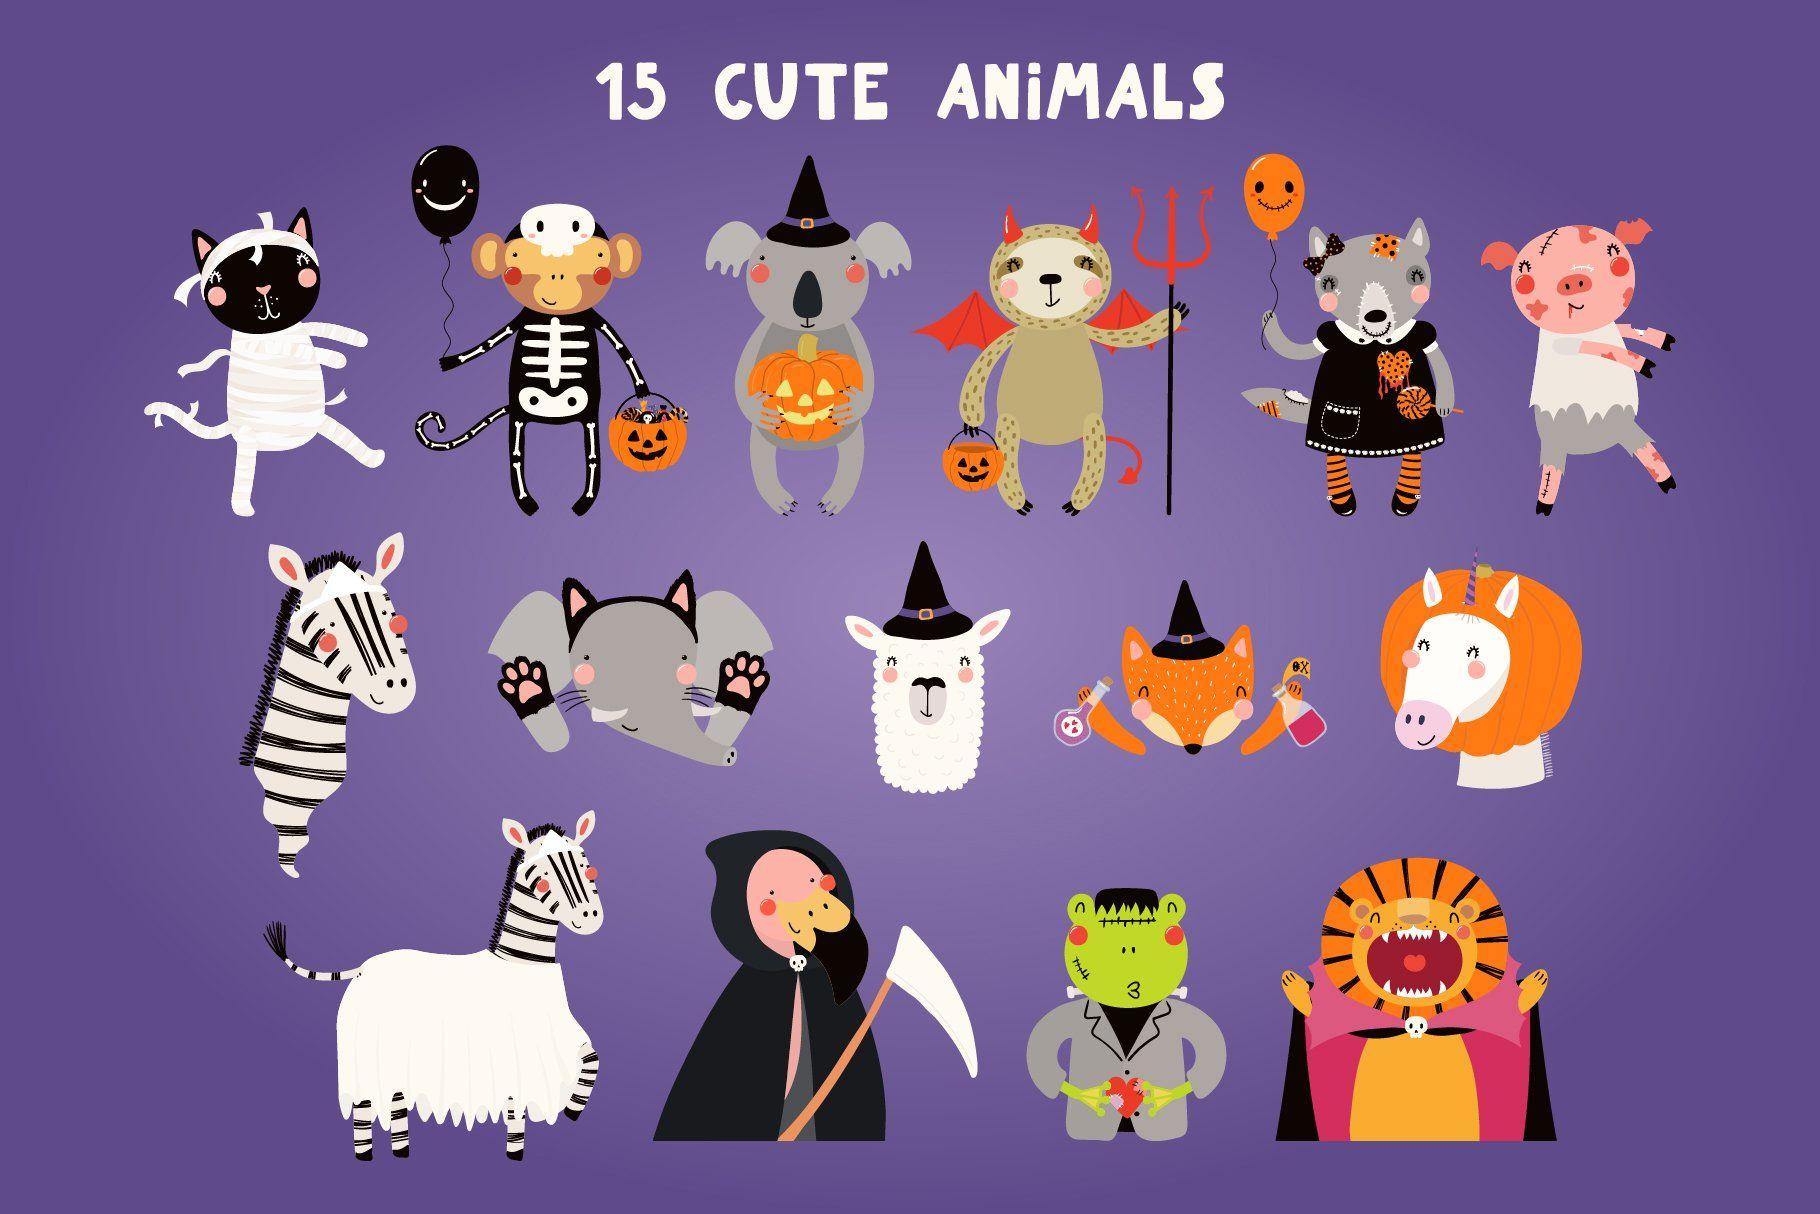 Halloween Party Cute Animals Clipart Cute Animal Clipart Animal Clipart Cute Animals